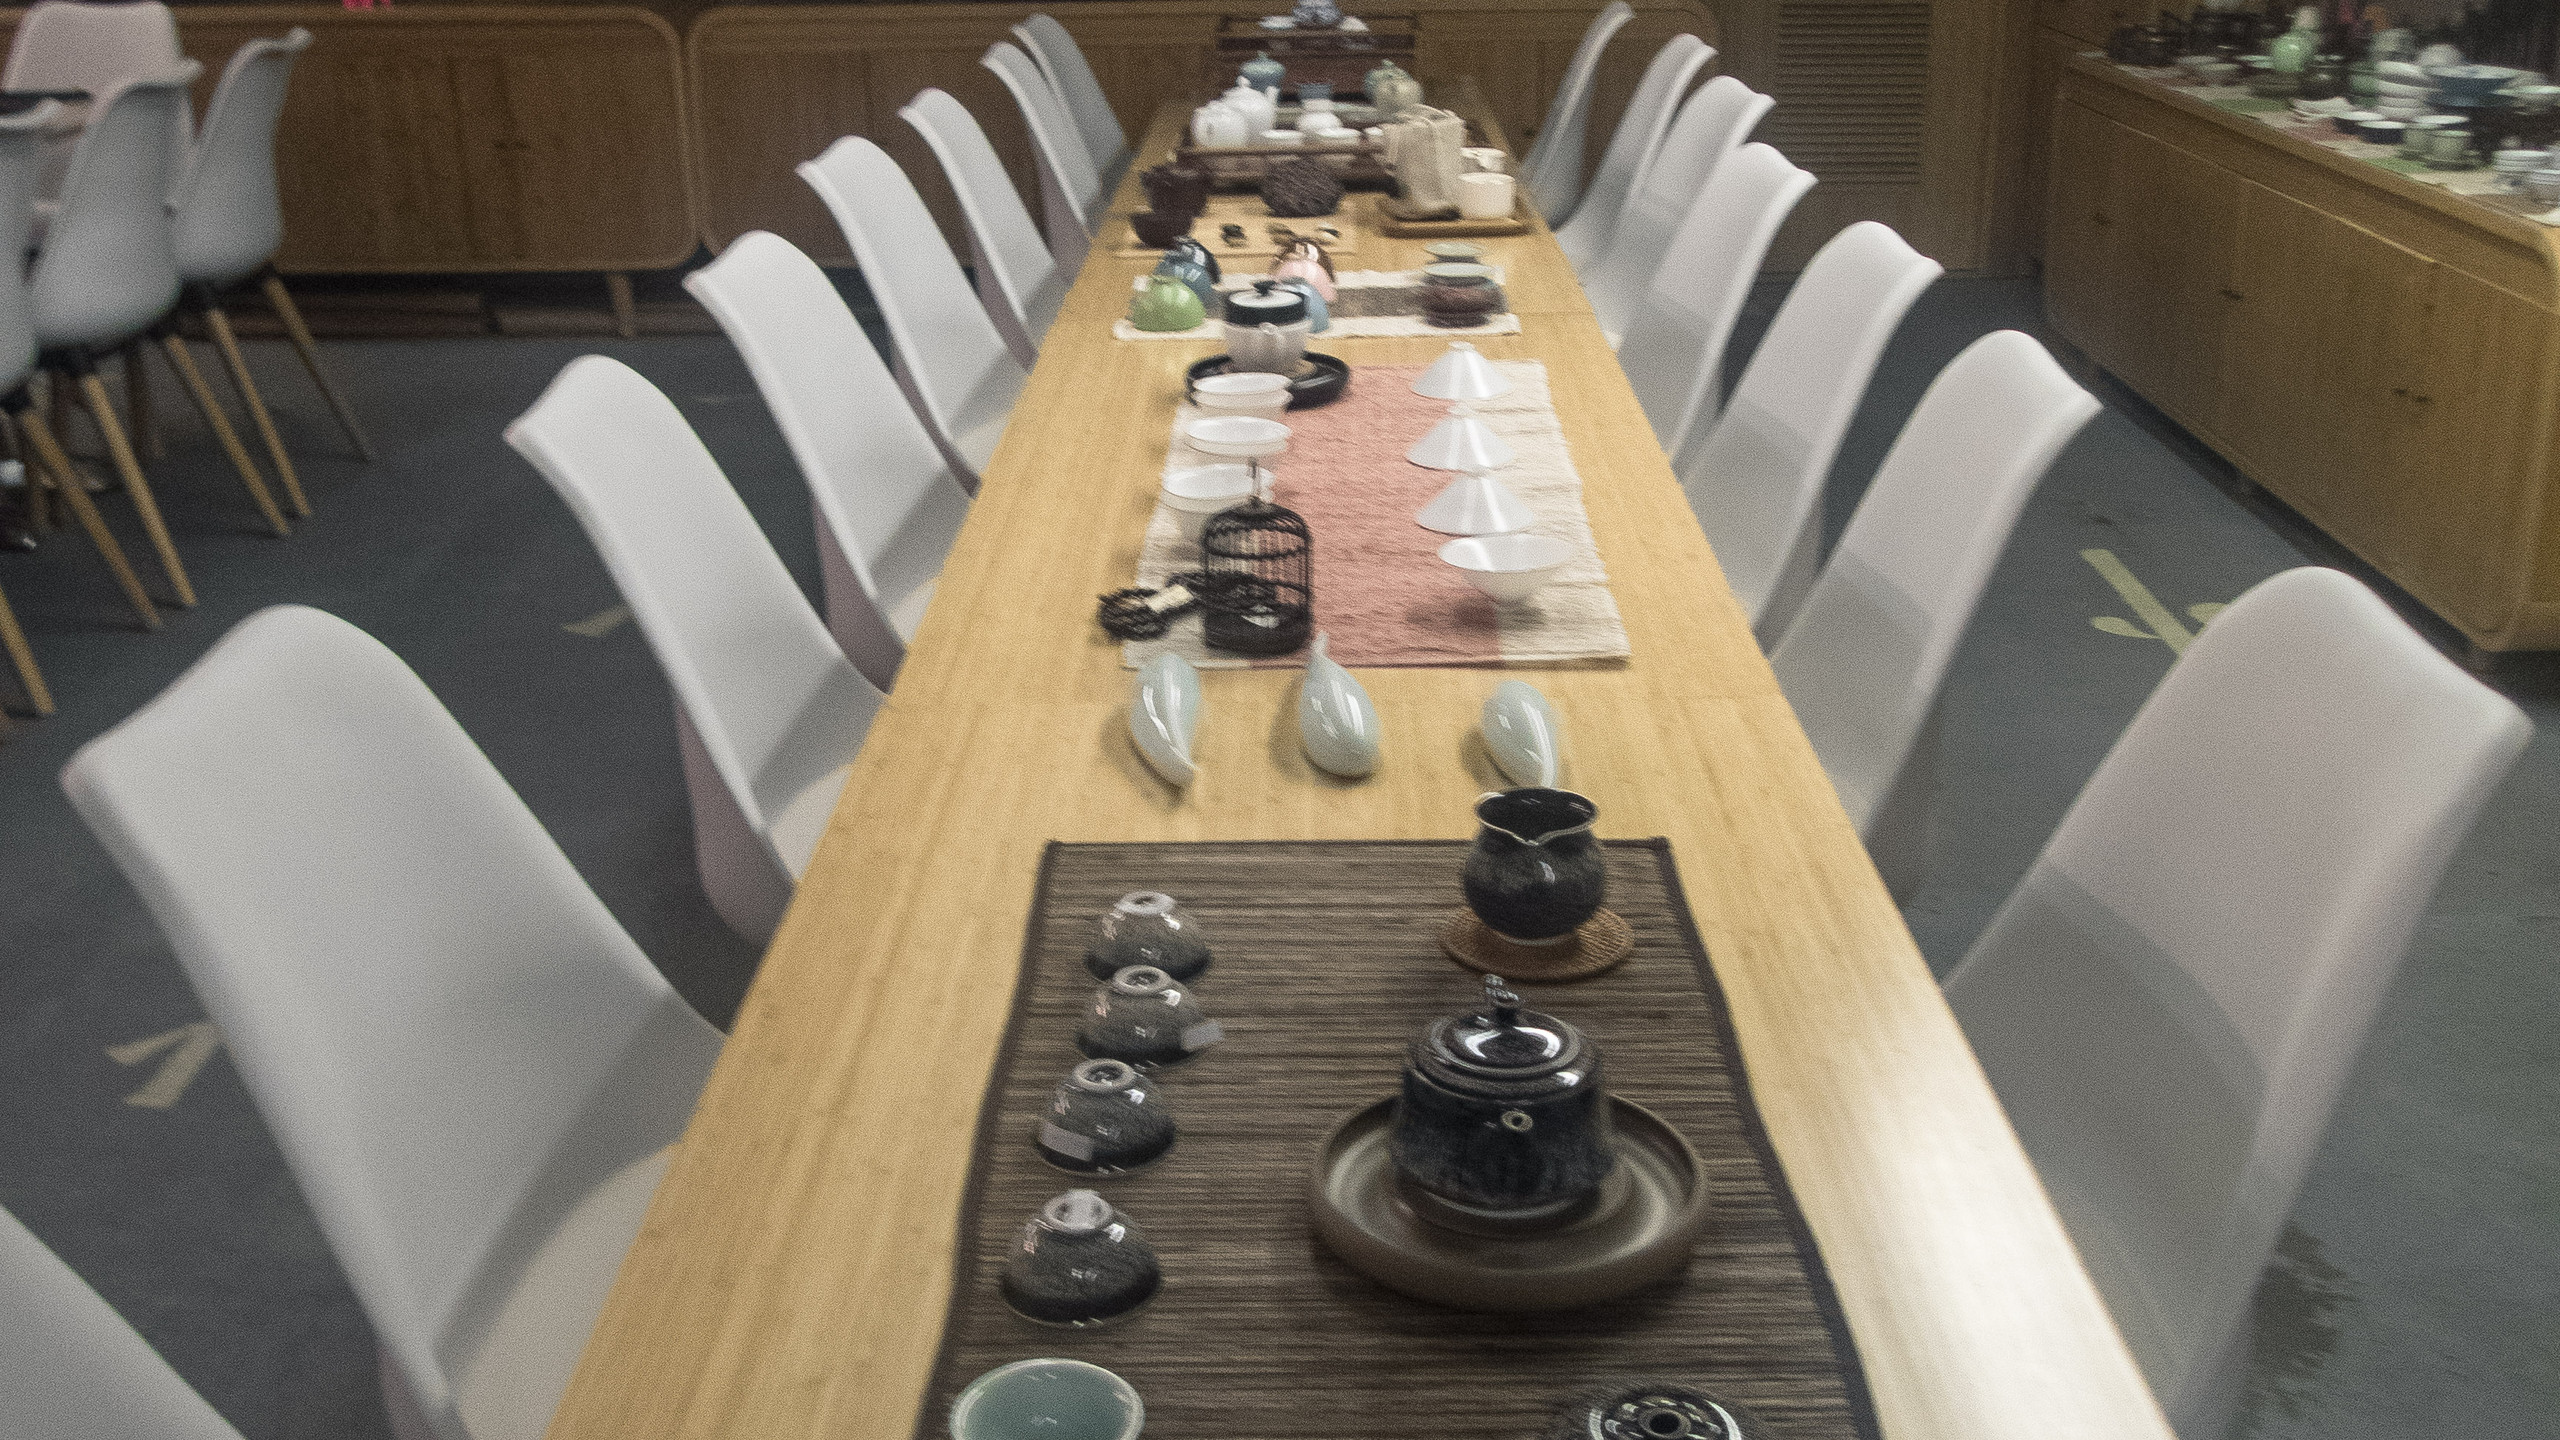 Long tables for tea ceremonies